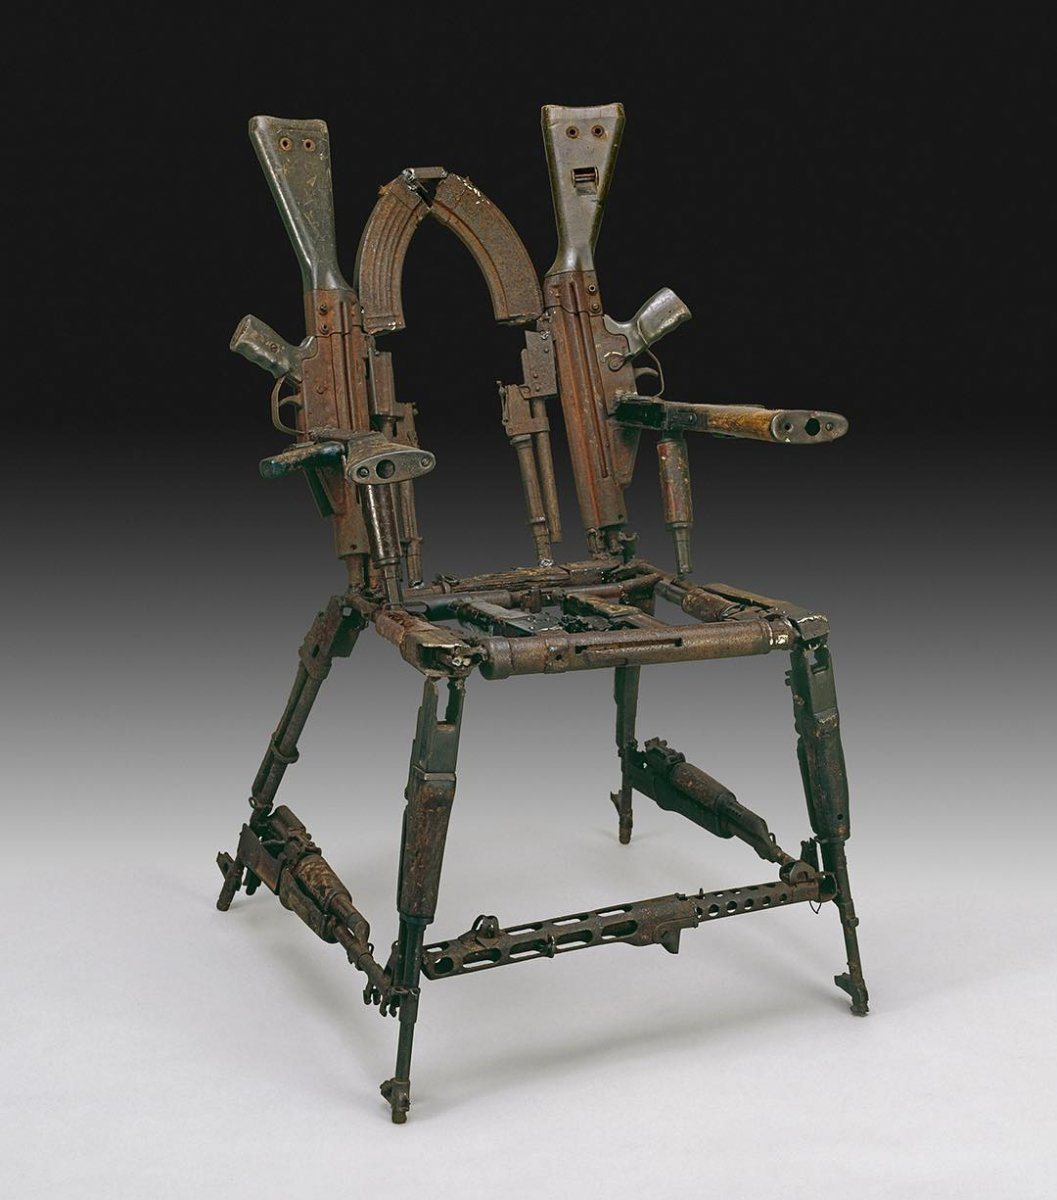 Throne of Weapons, Kester Canhavato, 2001 @britishmuseum.jpg